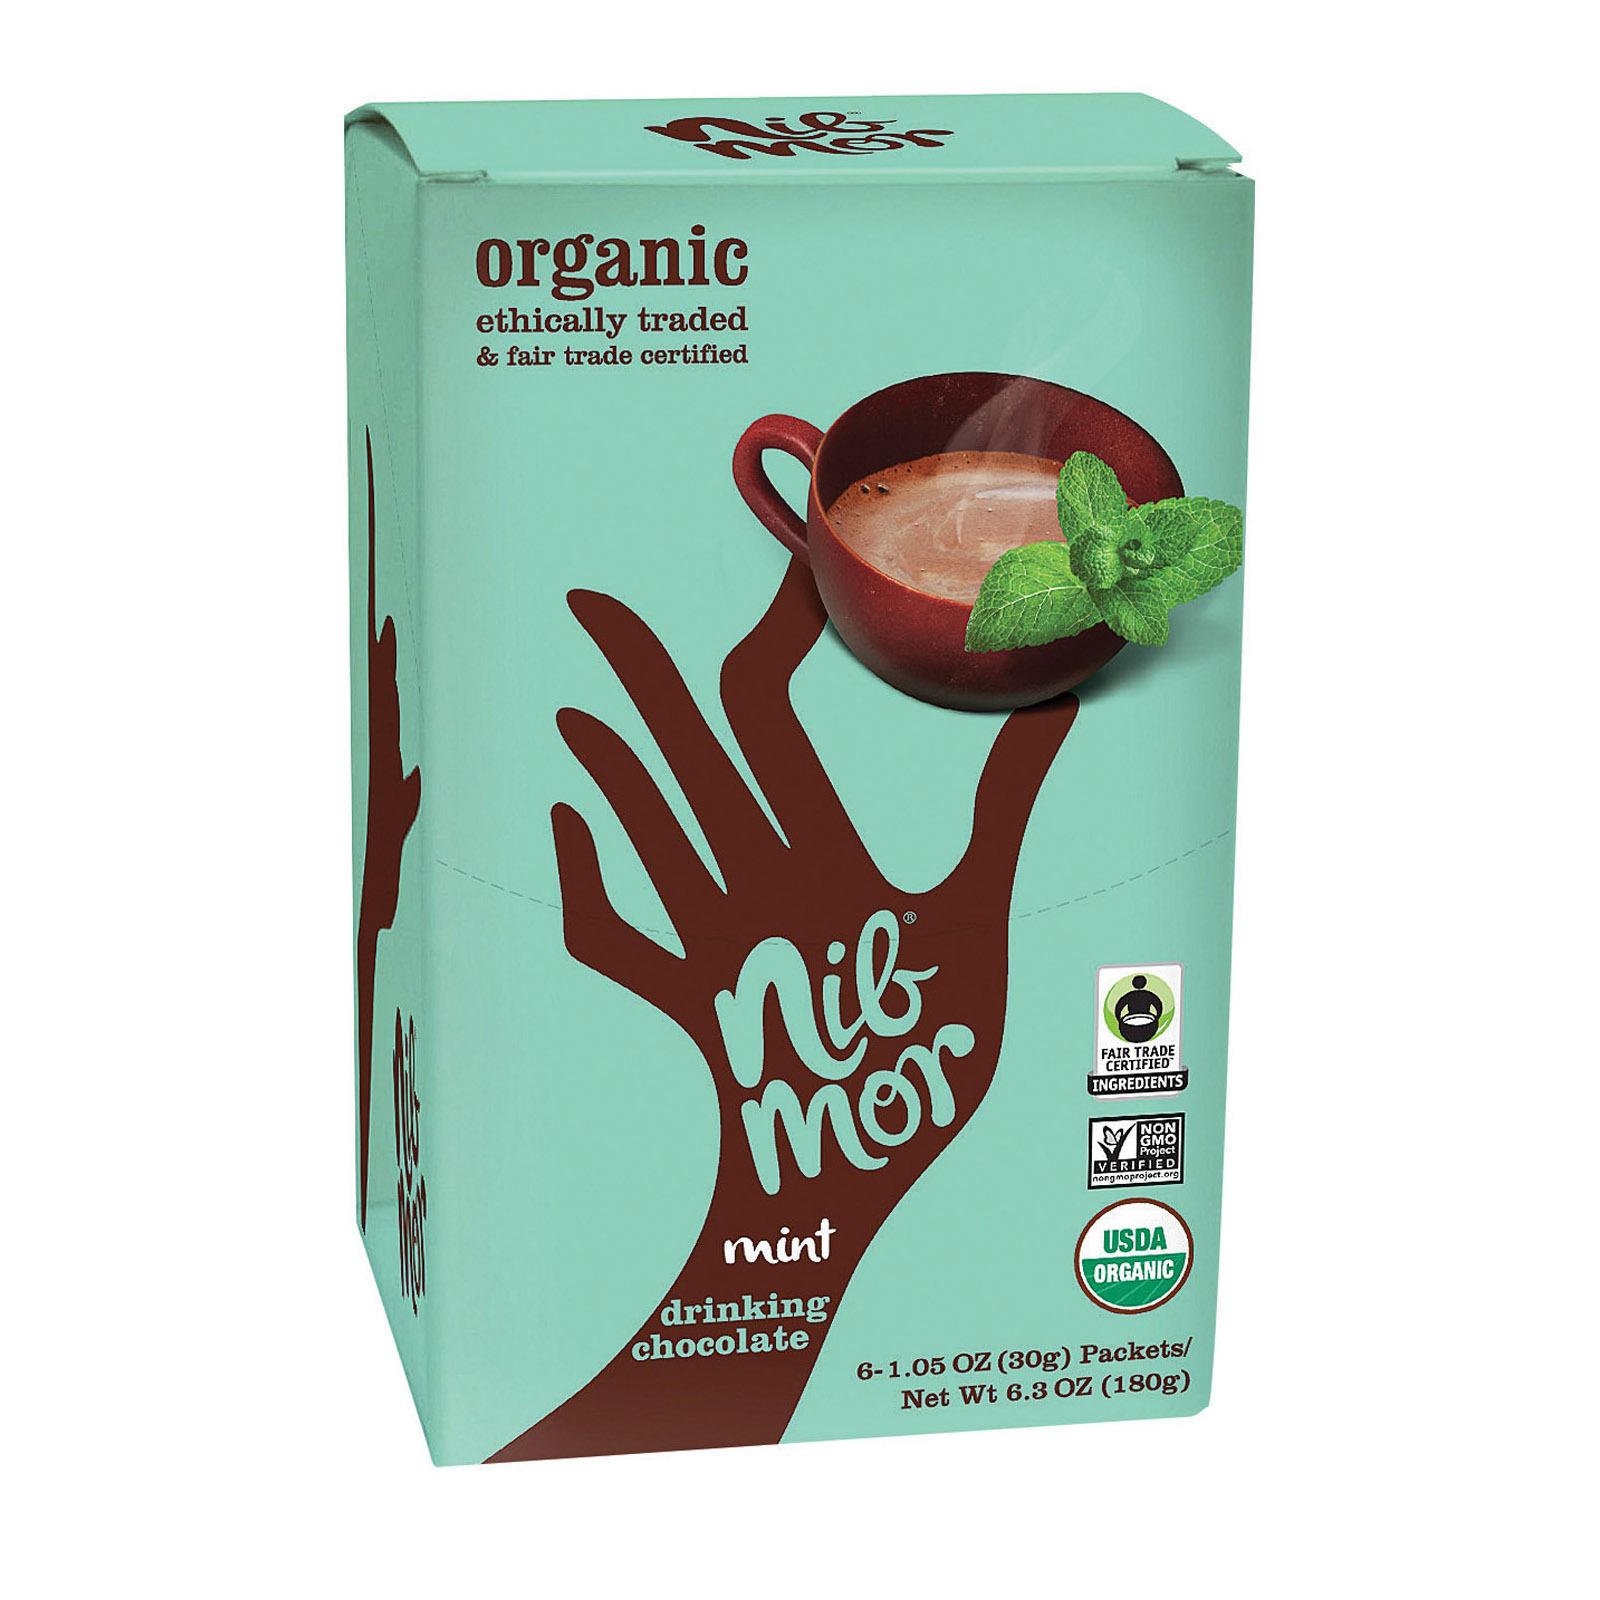 Nibmor Organic Drinking Chocolate - Mint - Case of 6 - 1.05 oz